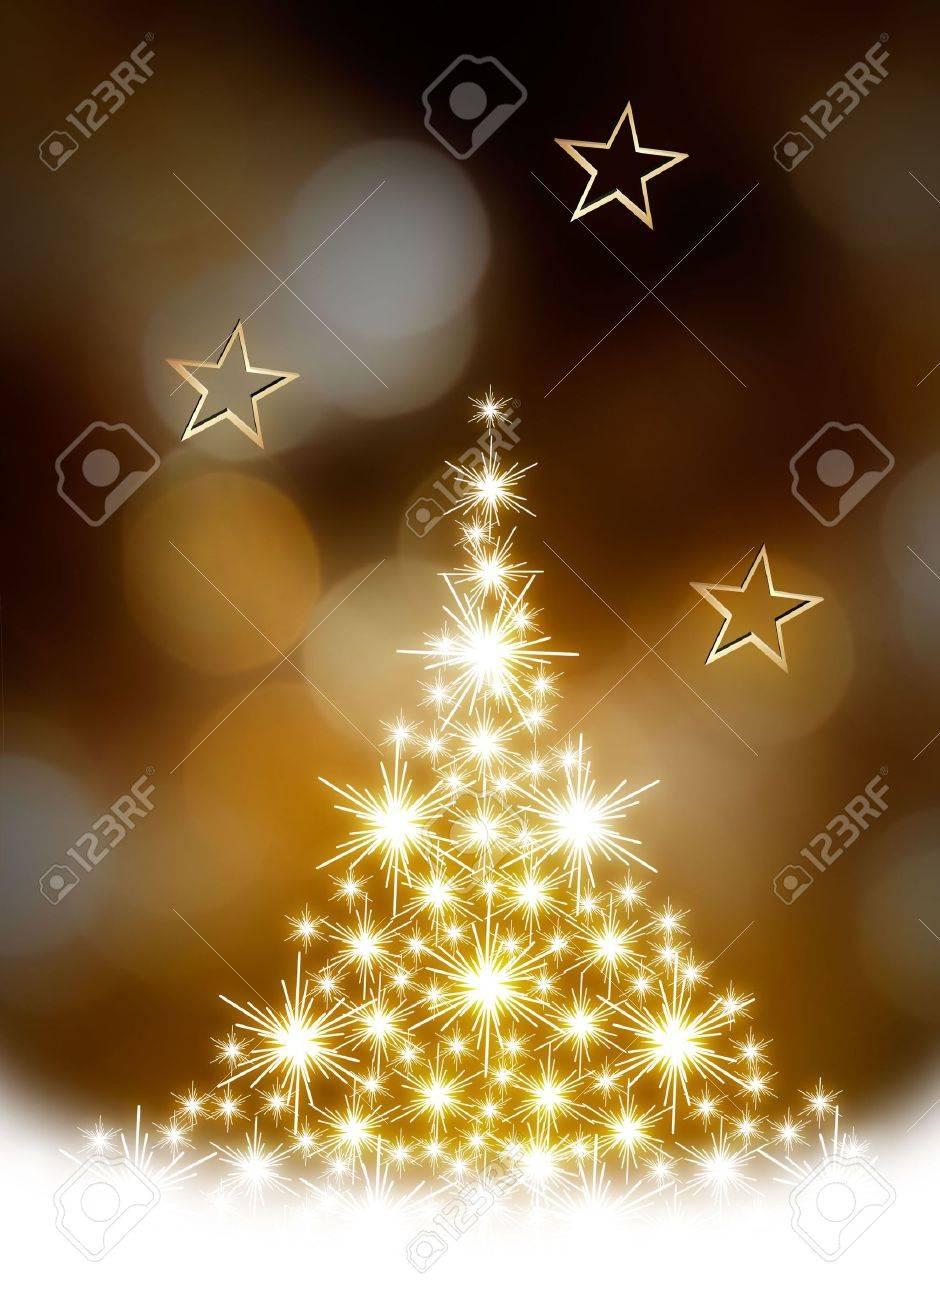 Christmas tree illustration on golden background - 3780850